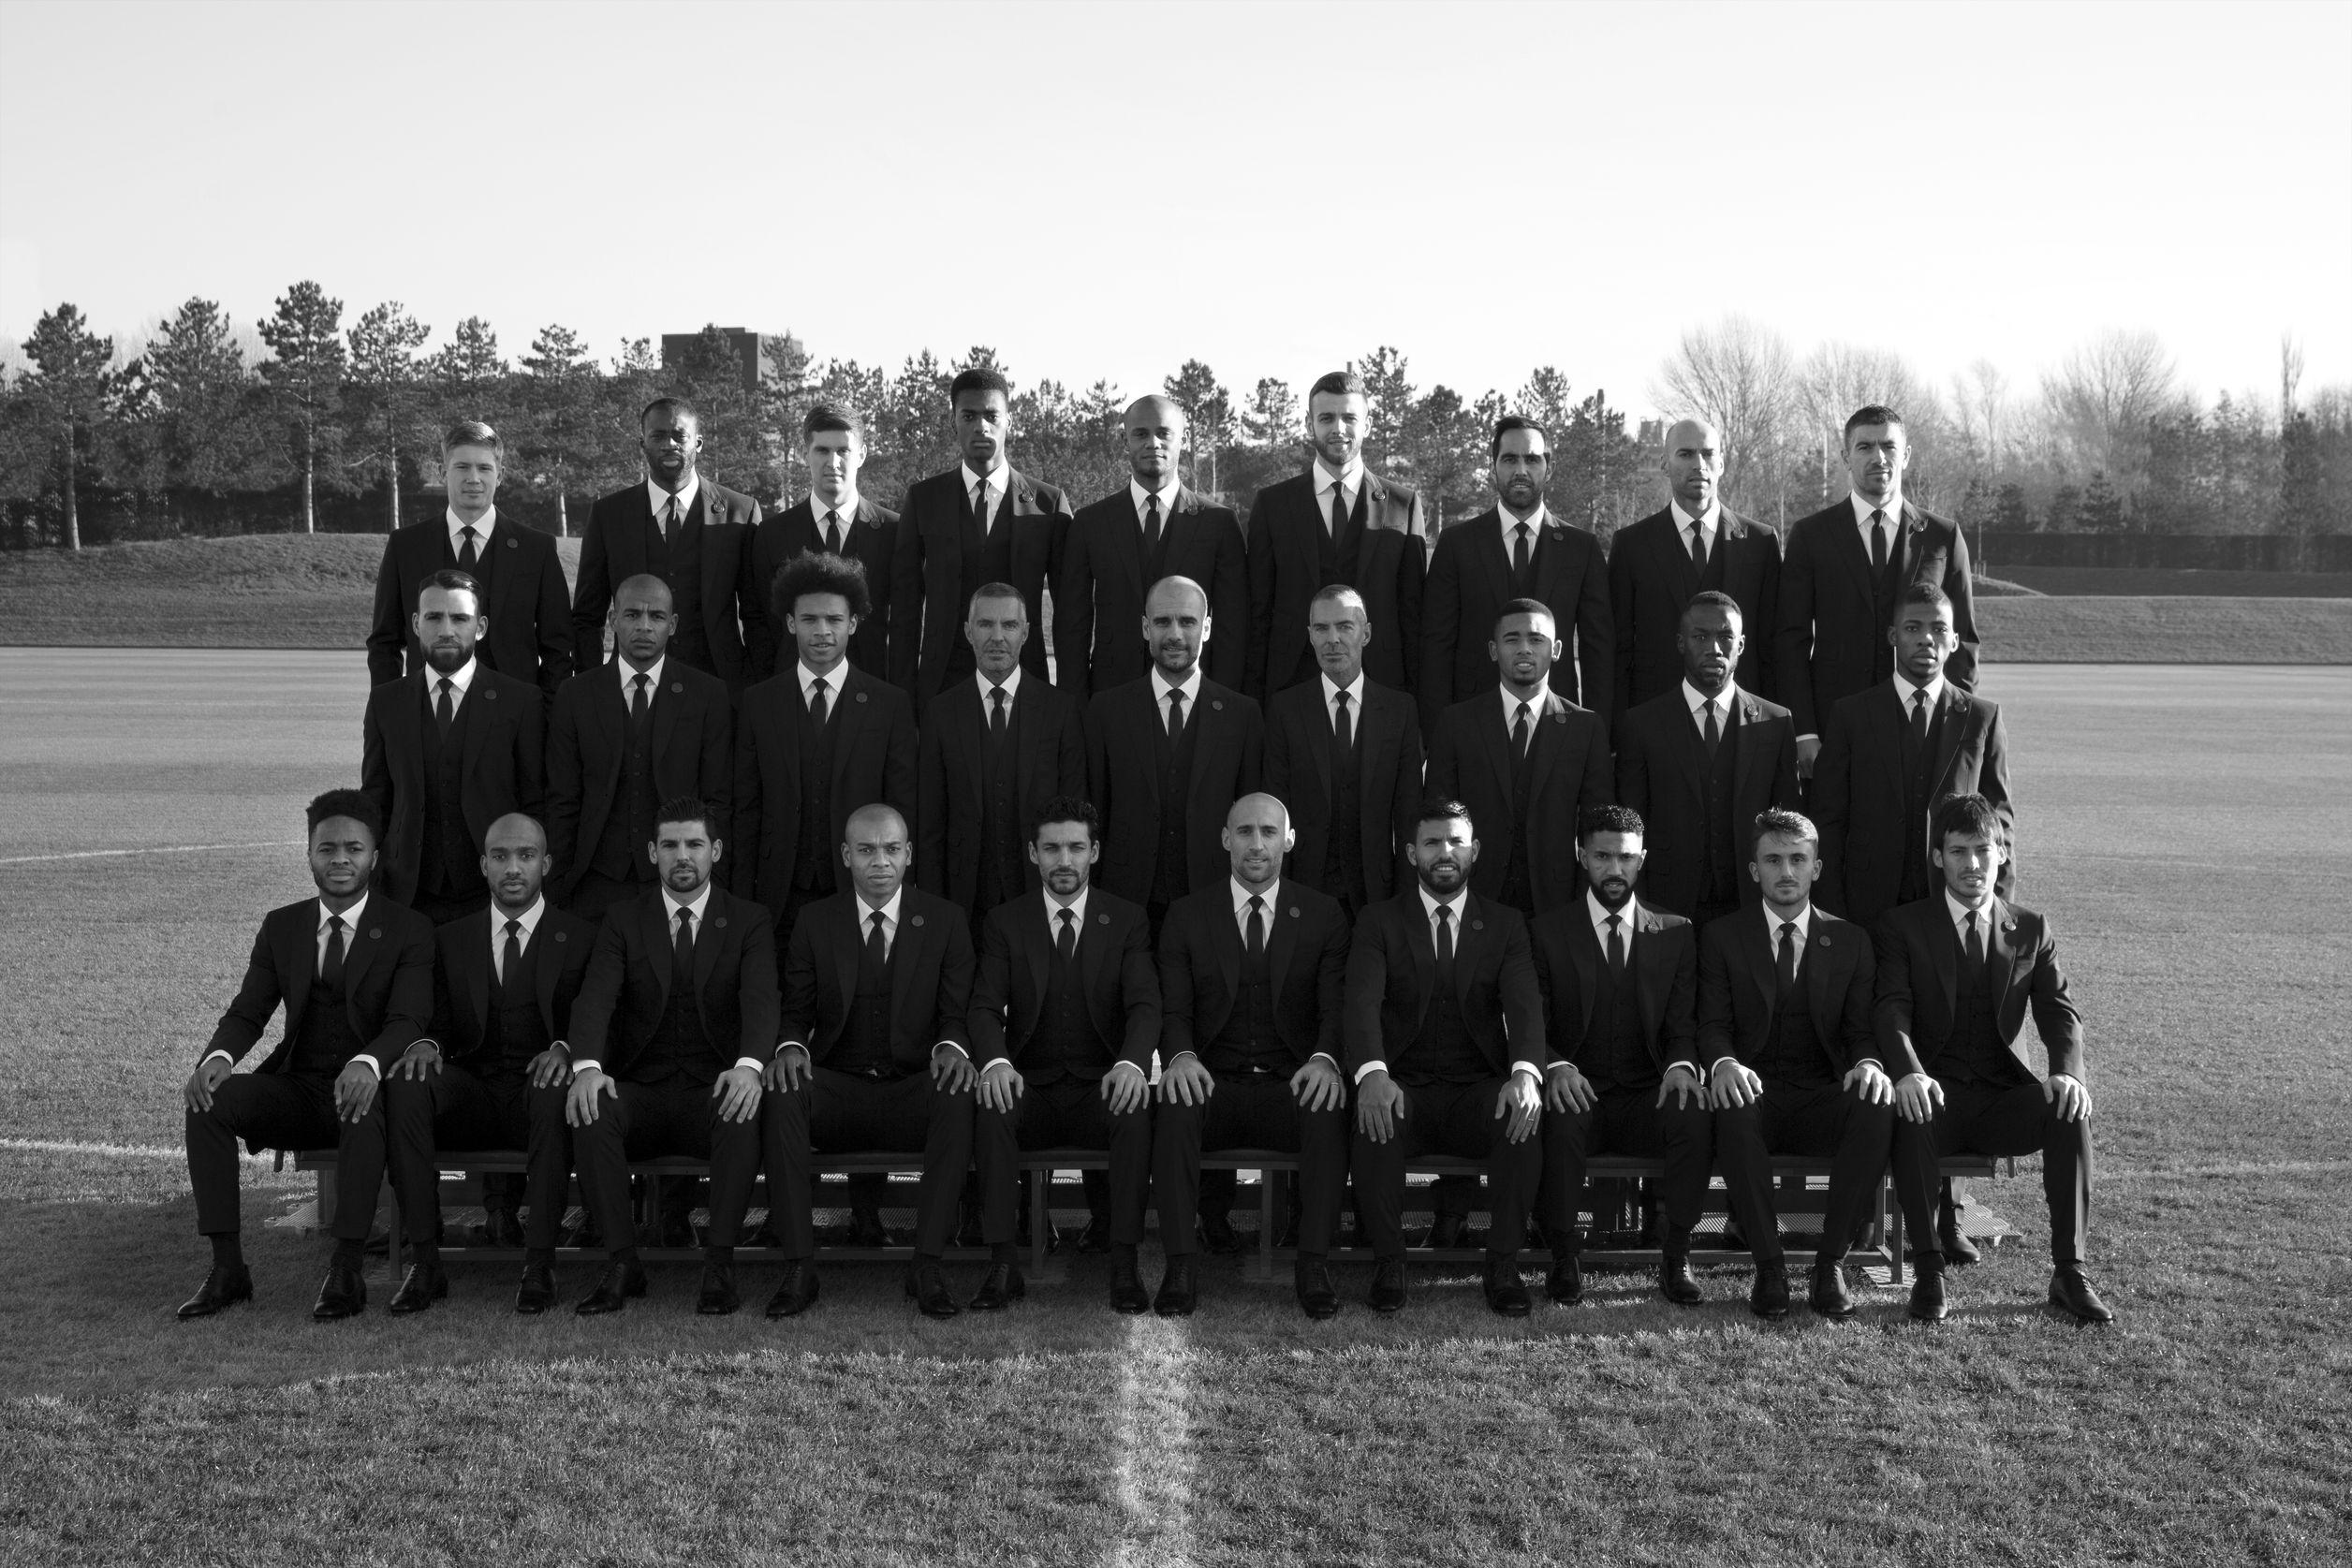 Manchester City soccer team